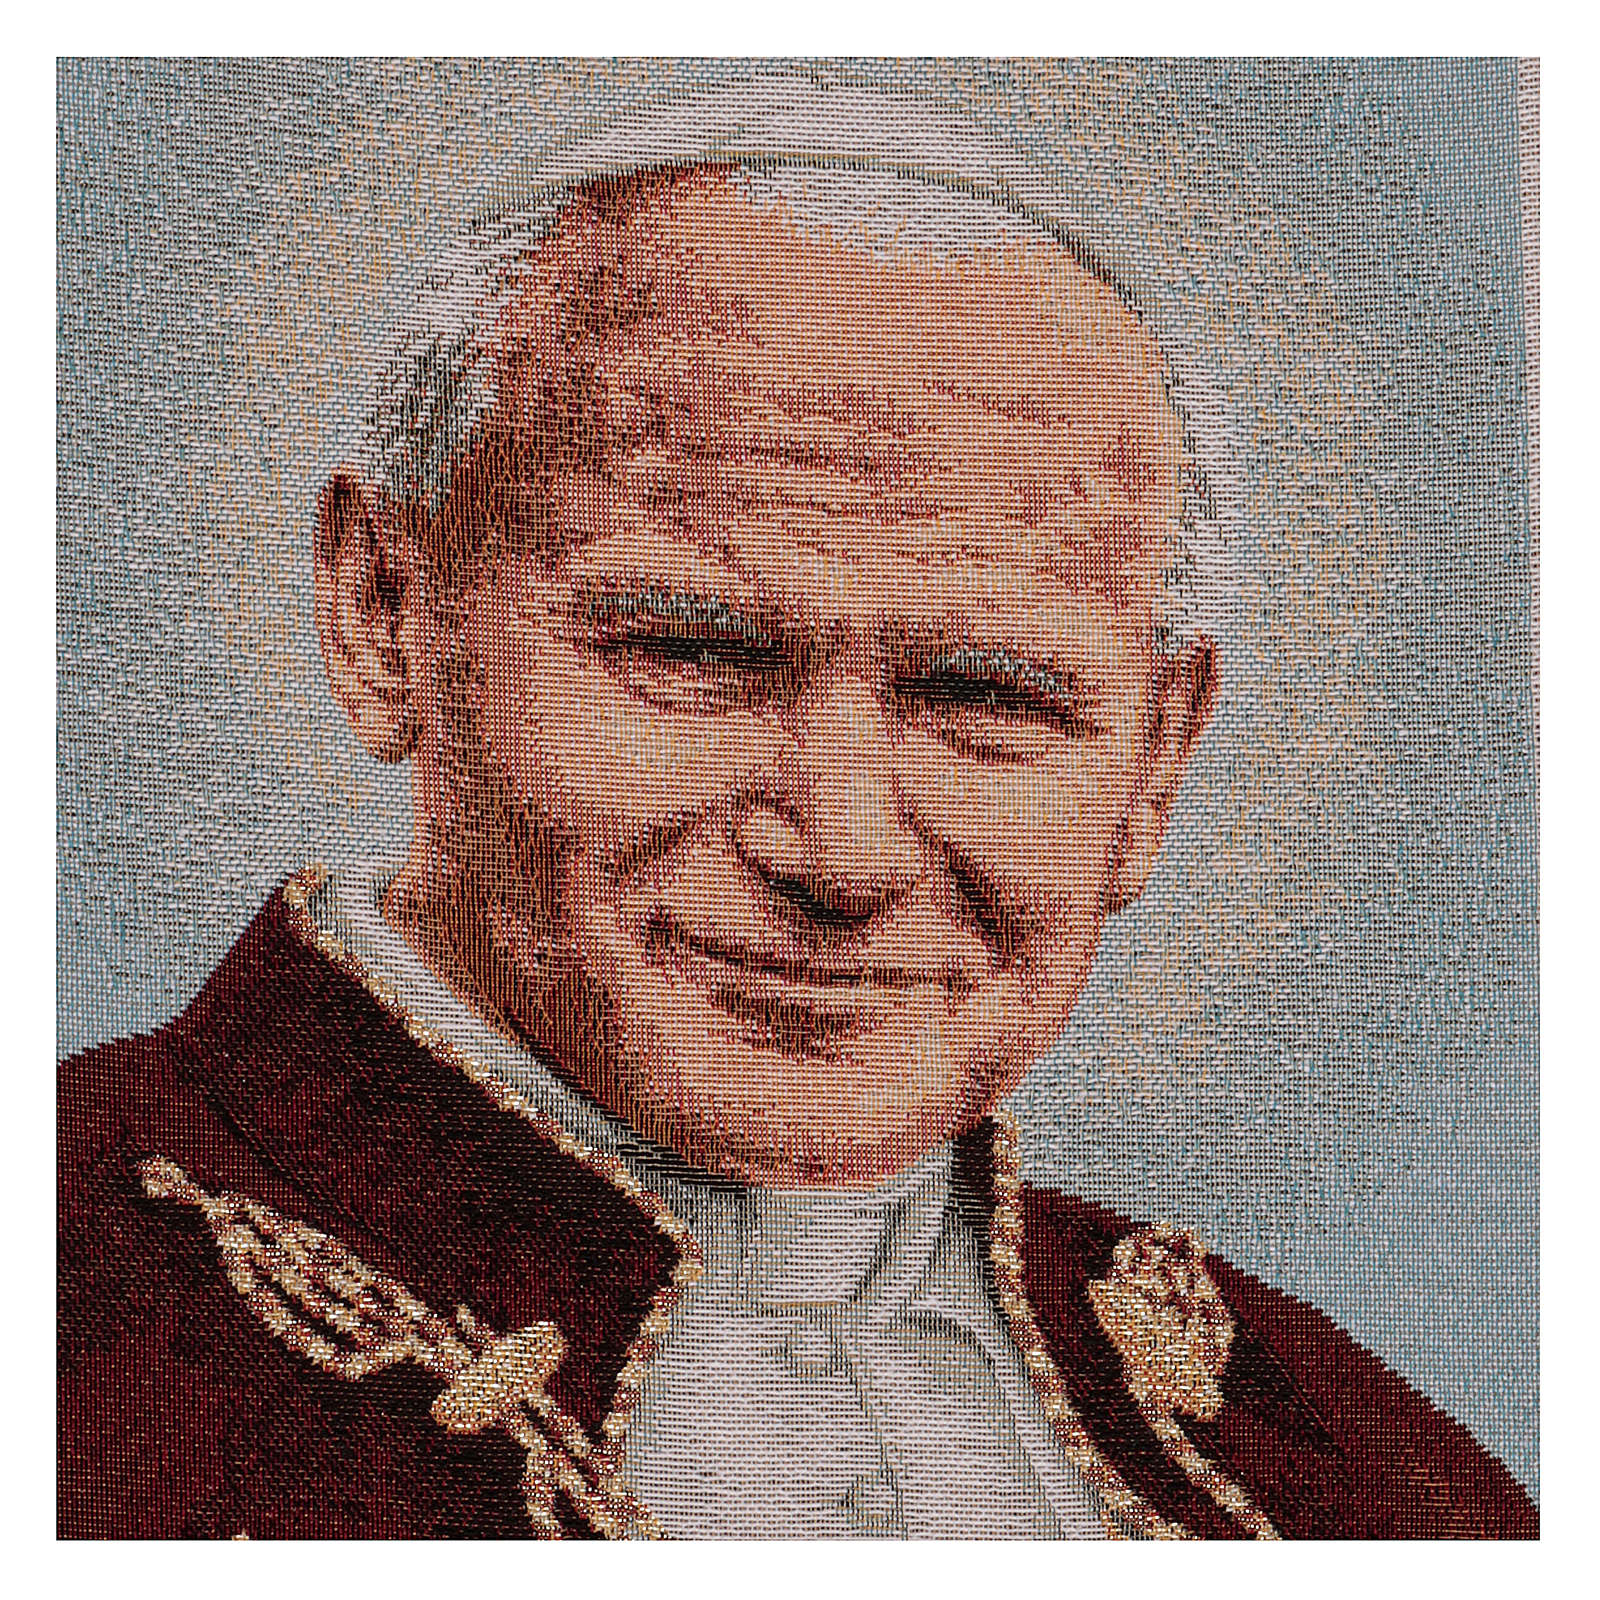 Tapisserie Pape Jean-Paul II avec armoiries 40x30 cm 3